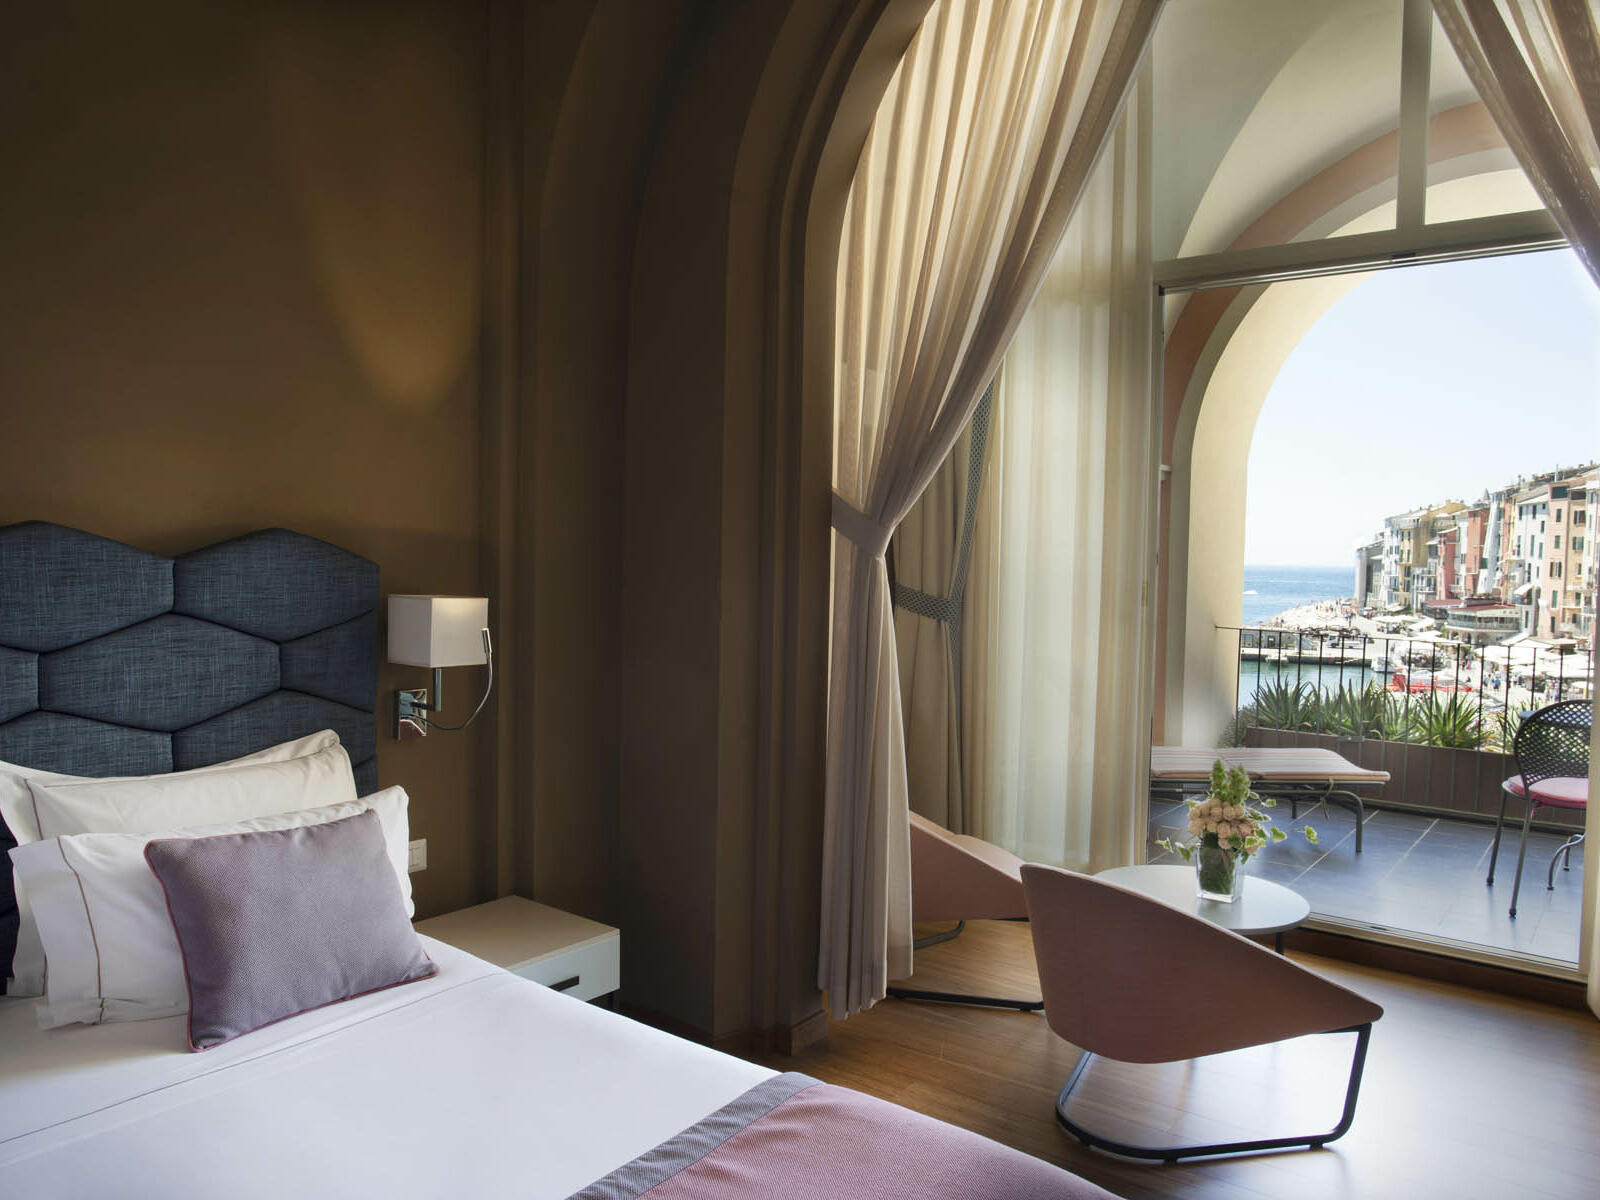 Comfy Bedroom with balcony - Grand Hotel Portovenere